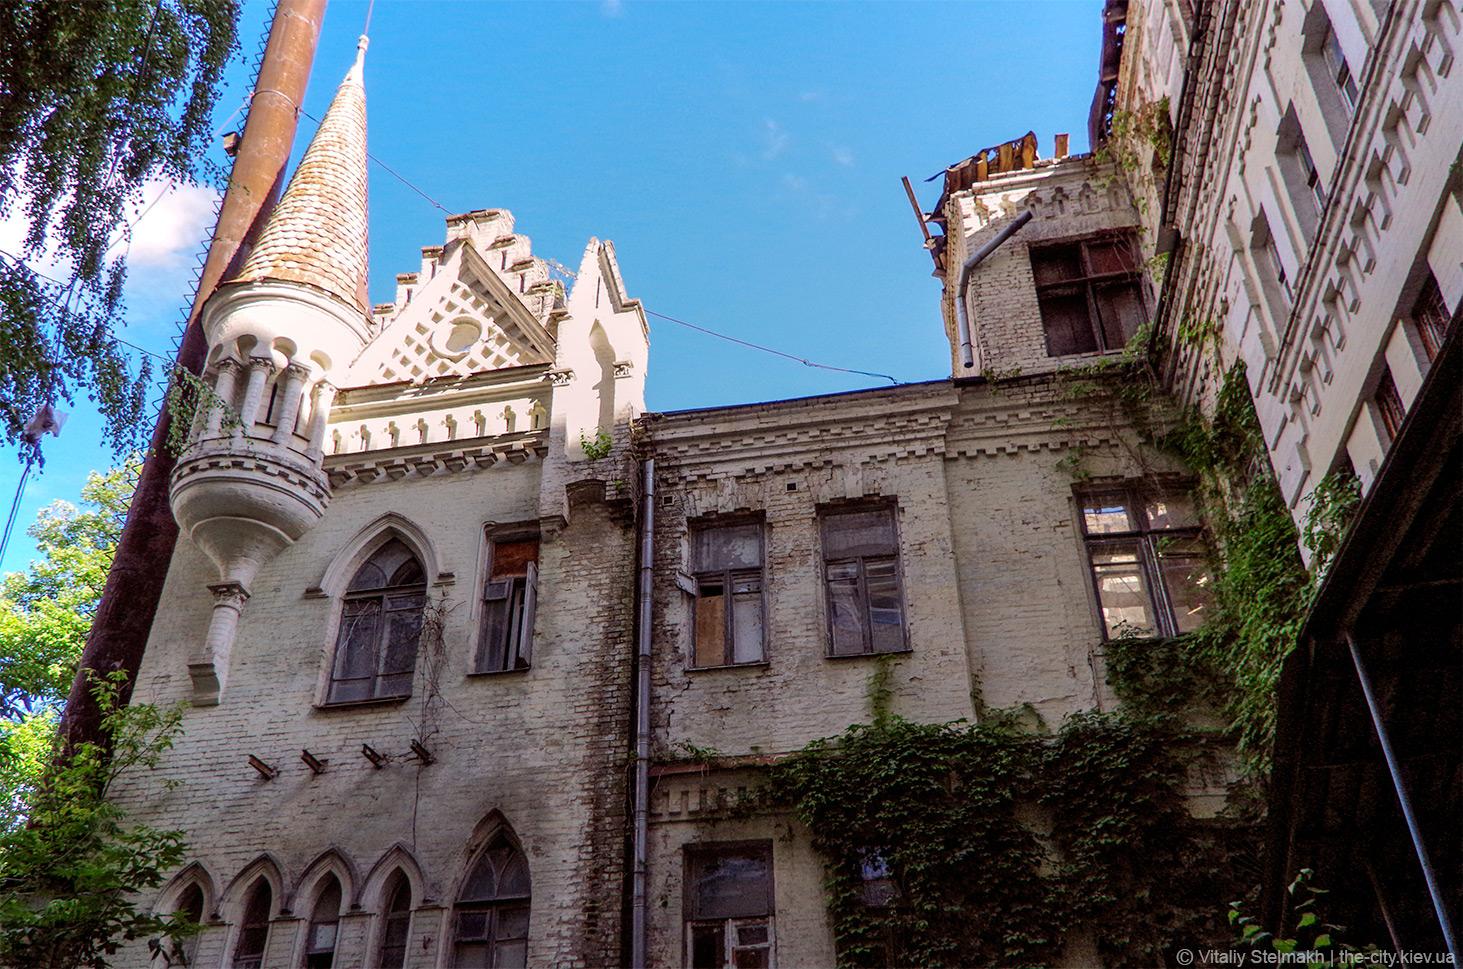 Фото замок барона Штейнгеля